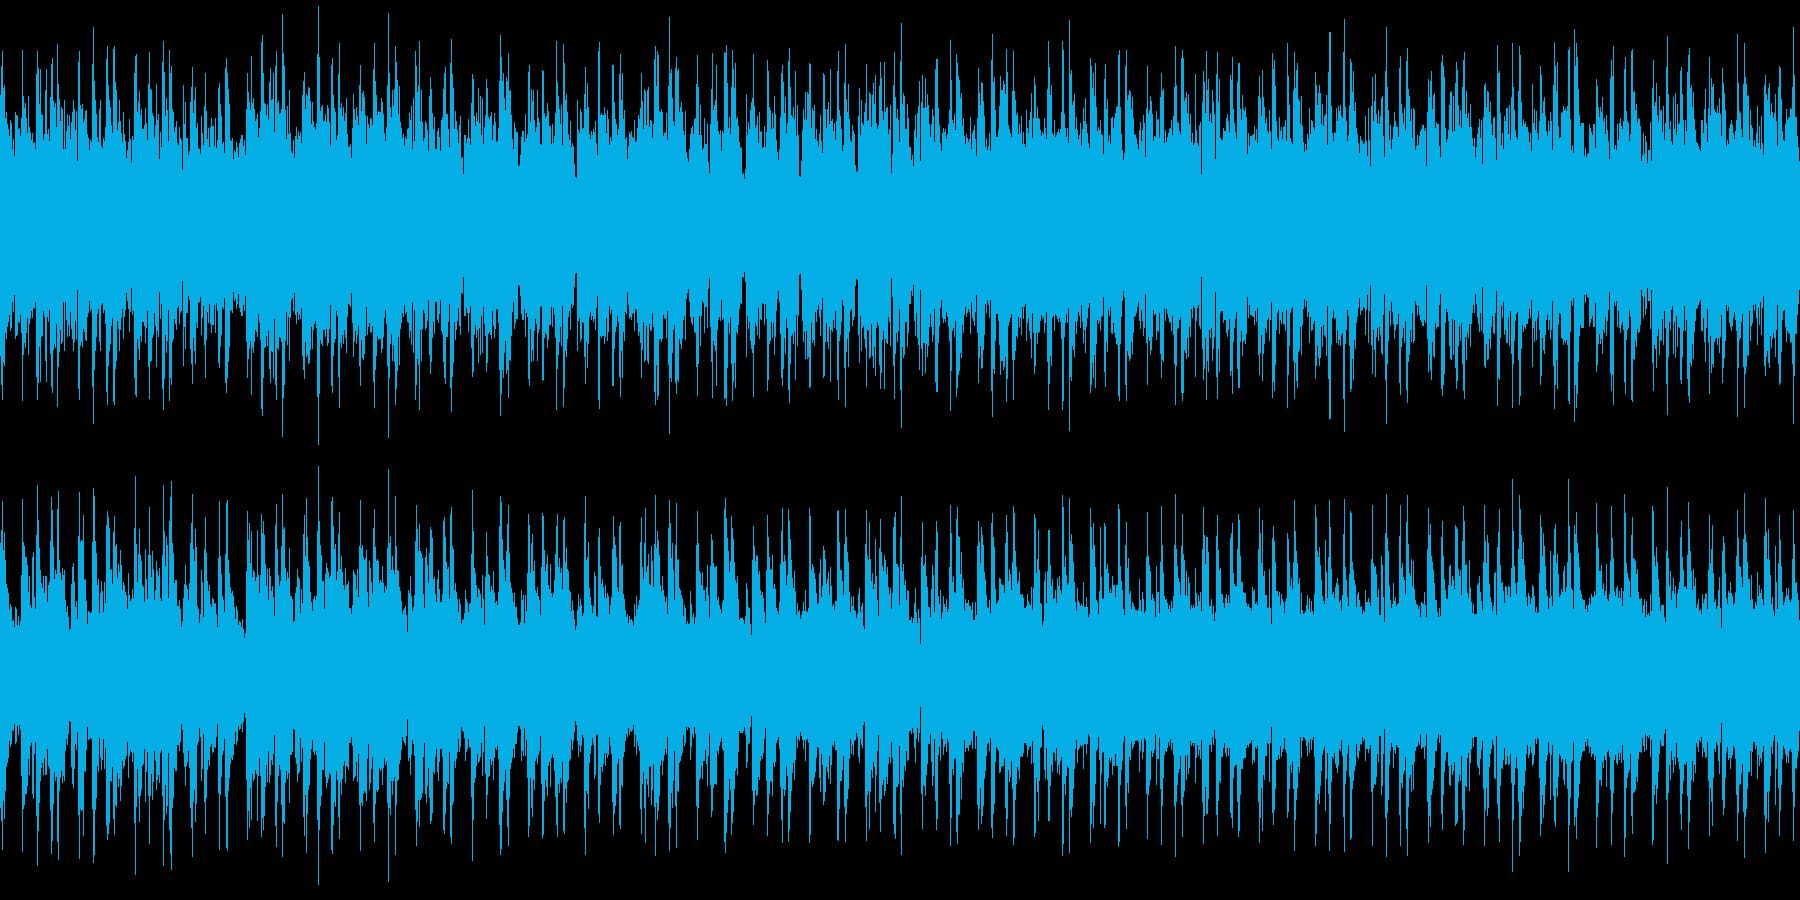 jazzを意識したシンプルなBGMの再生済みの波形